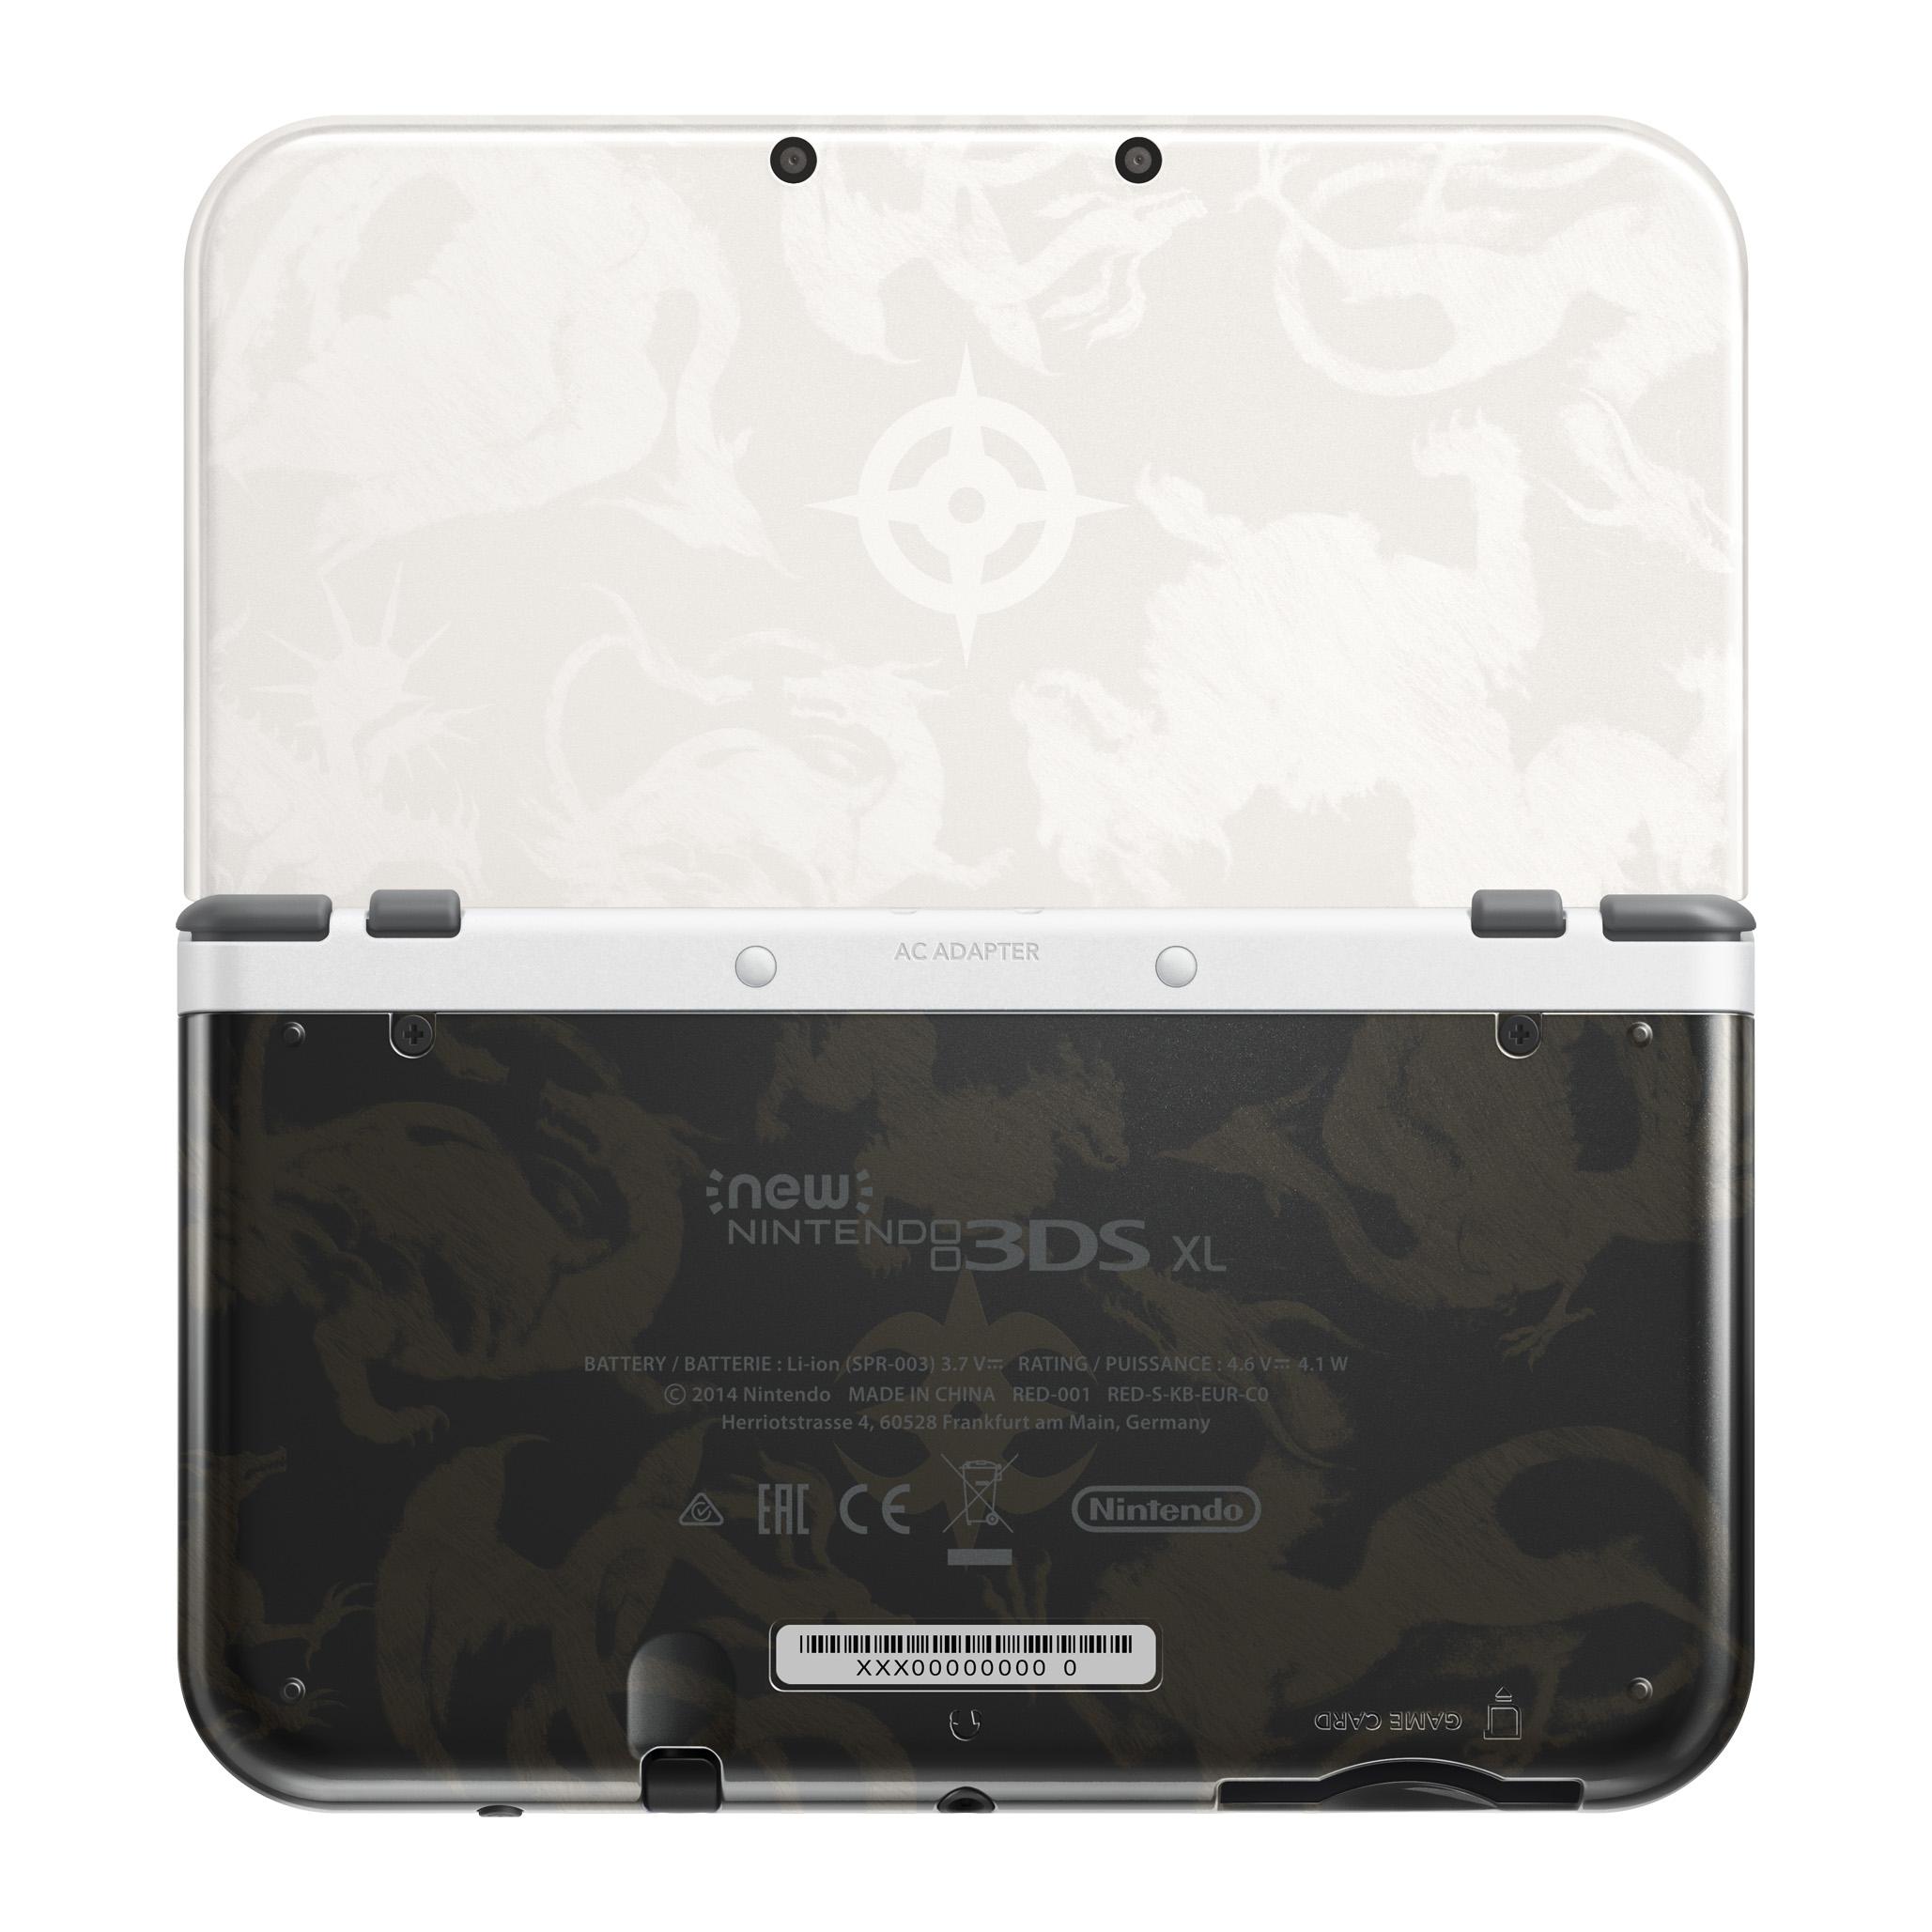 Nintendo Direct 0403 New Nintendo 3DS XL Fire Emblem Fates Edition